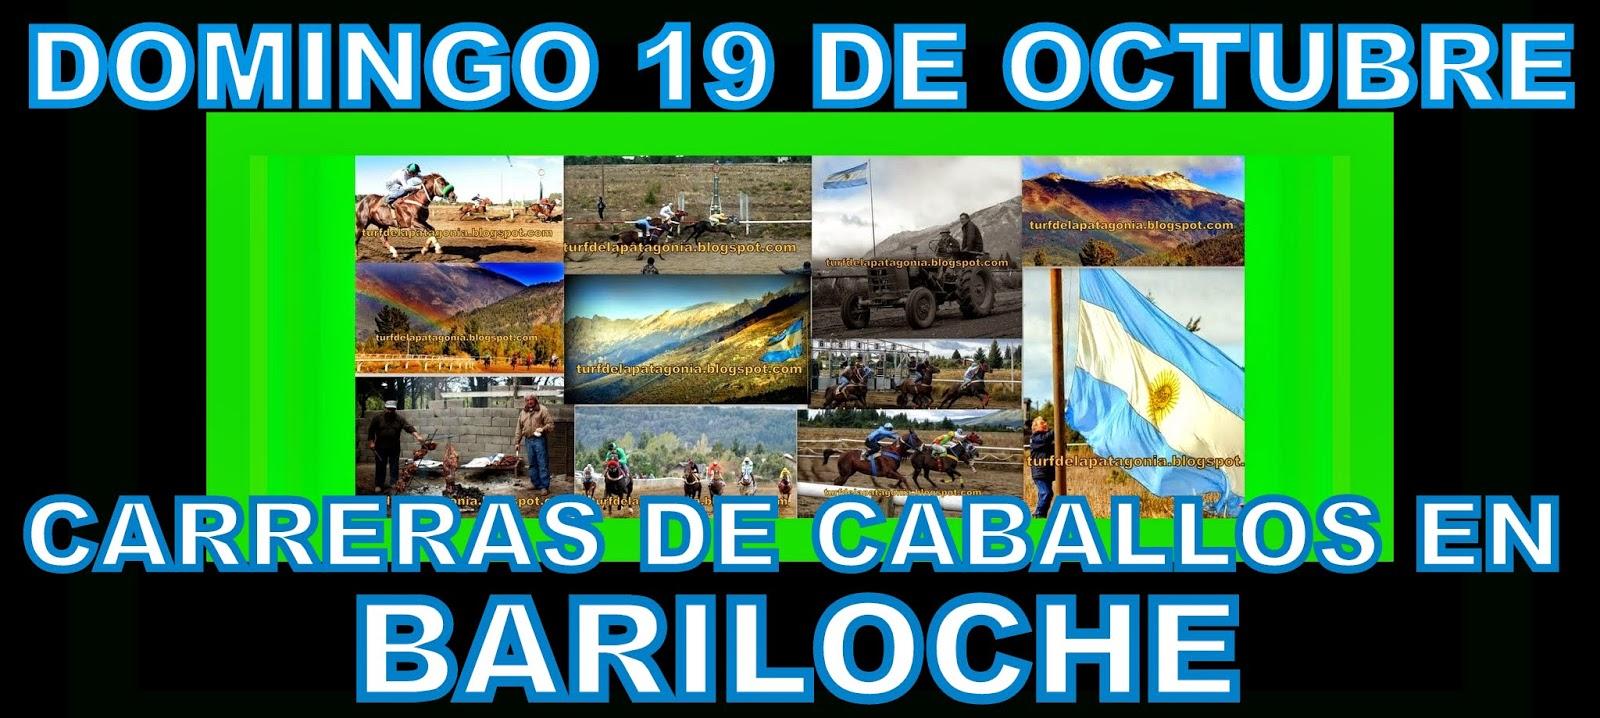 http://turfdelapatagonia.blogspot.com.ar/2014/10/1910-carreras-de-caballos-en-bariloche.html